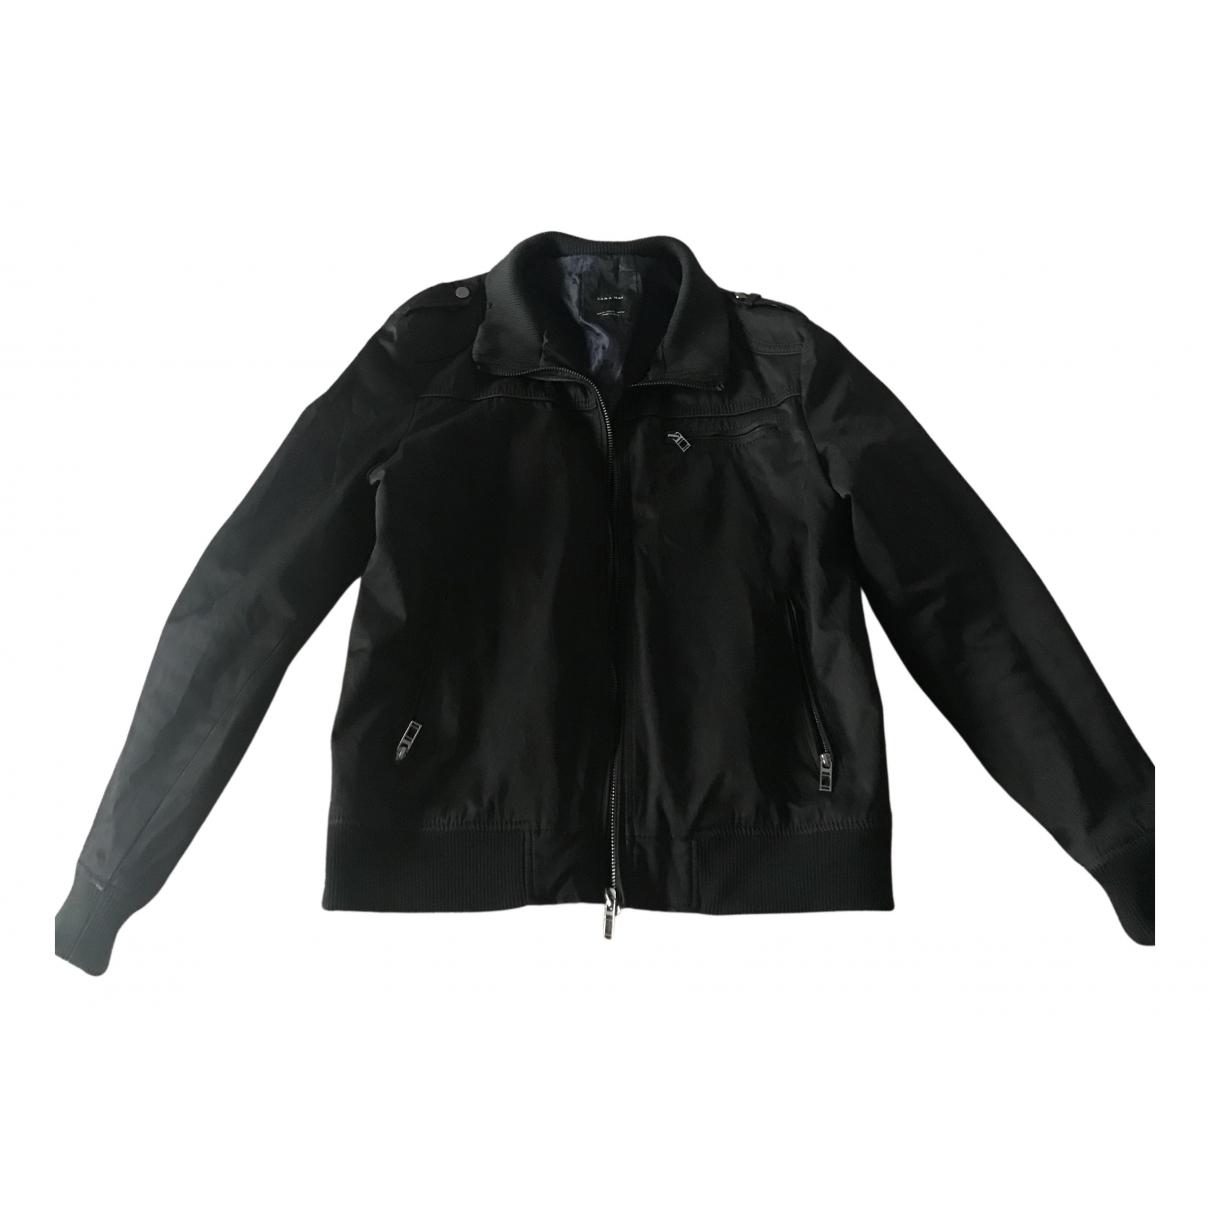 Zara \N Jacke in  Schwarz Polyester